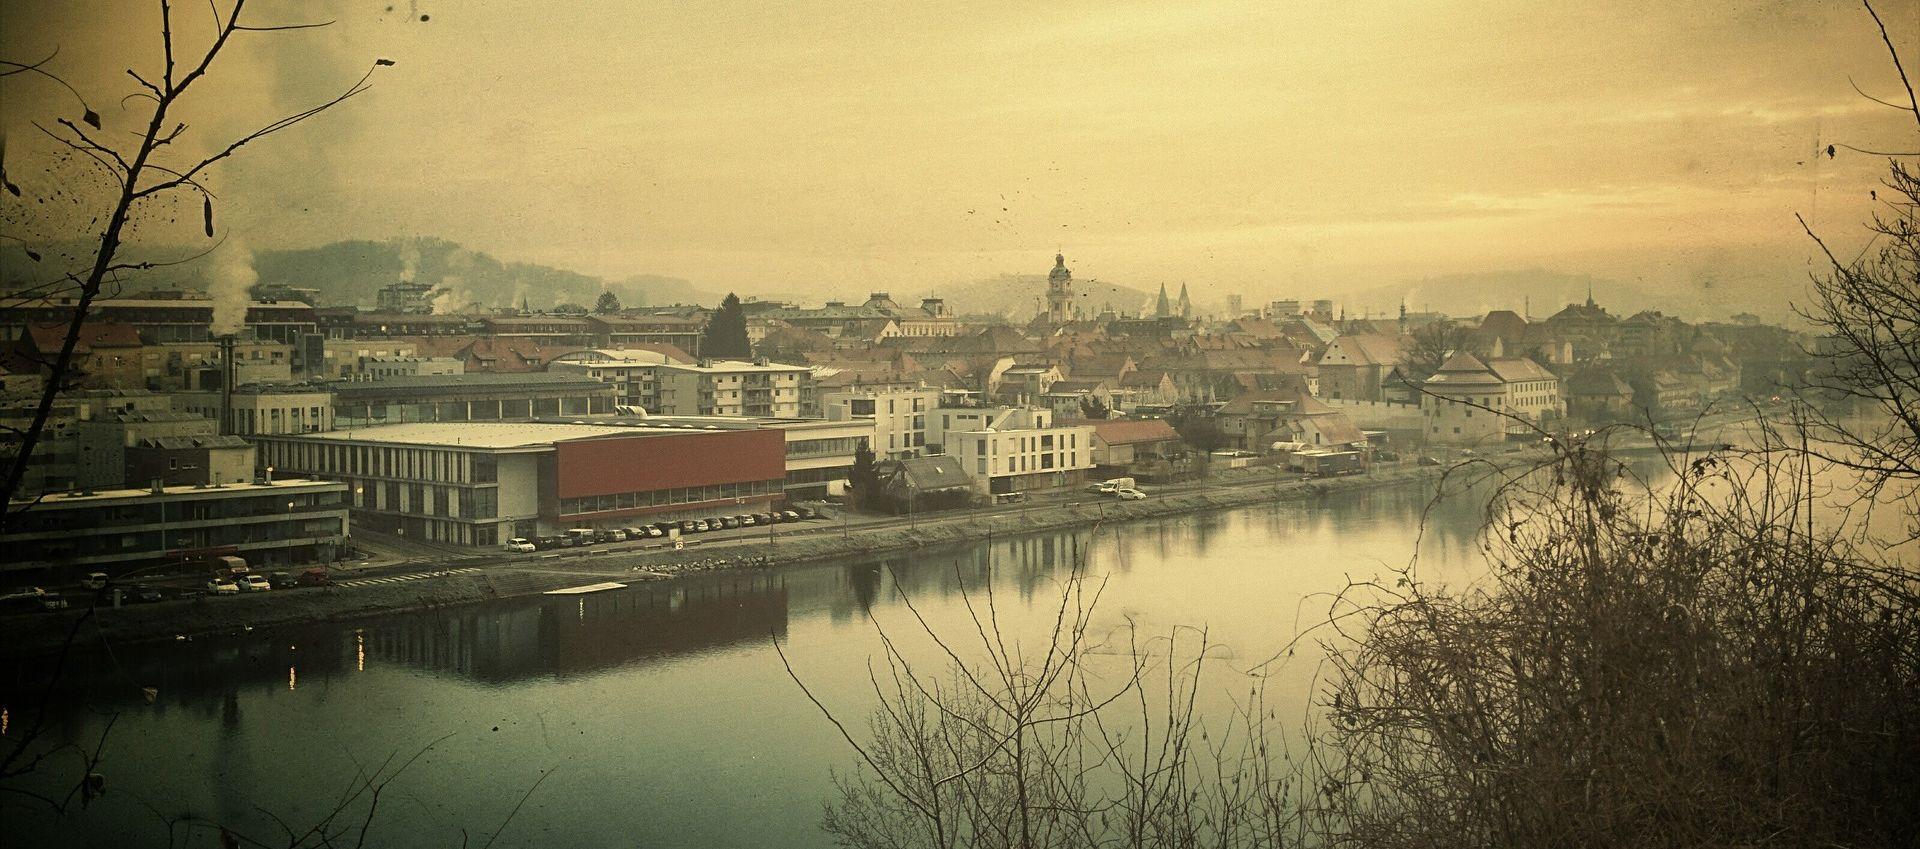 Slovenski Maribor dobio ime prije 180 godina, predložio ga Stanko Vraz